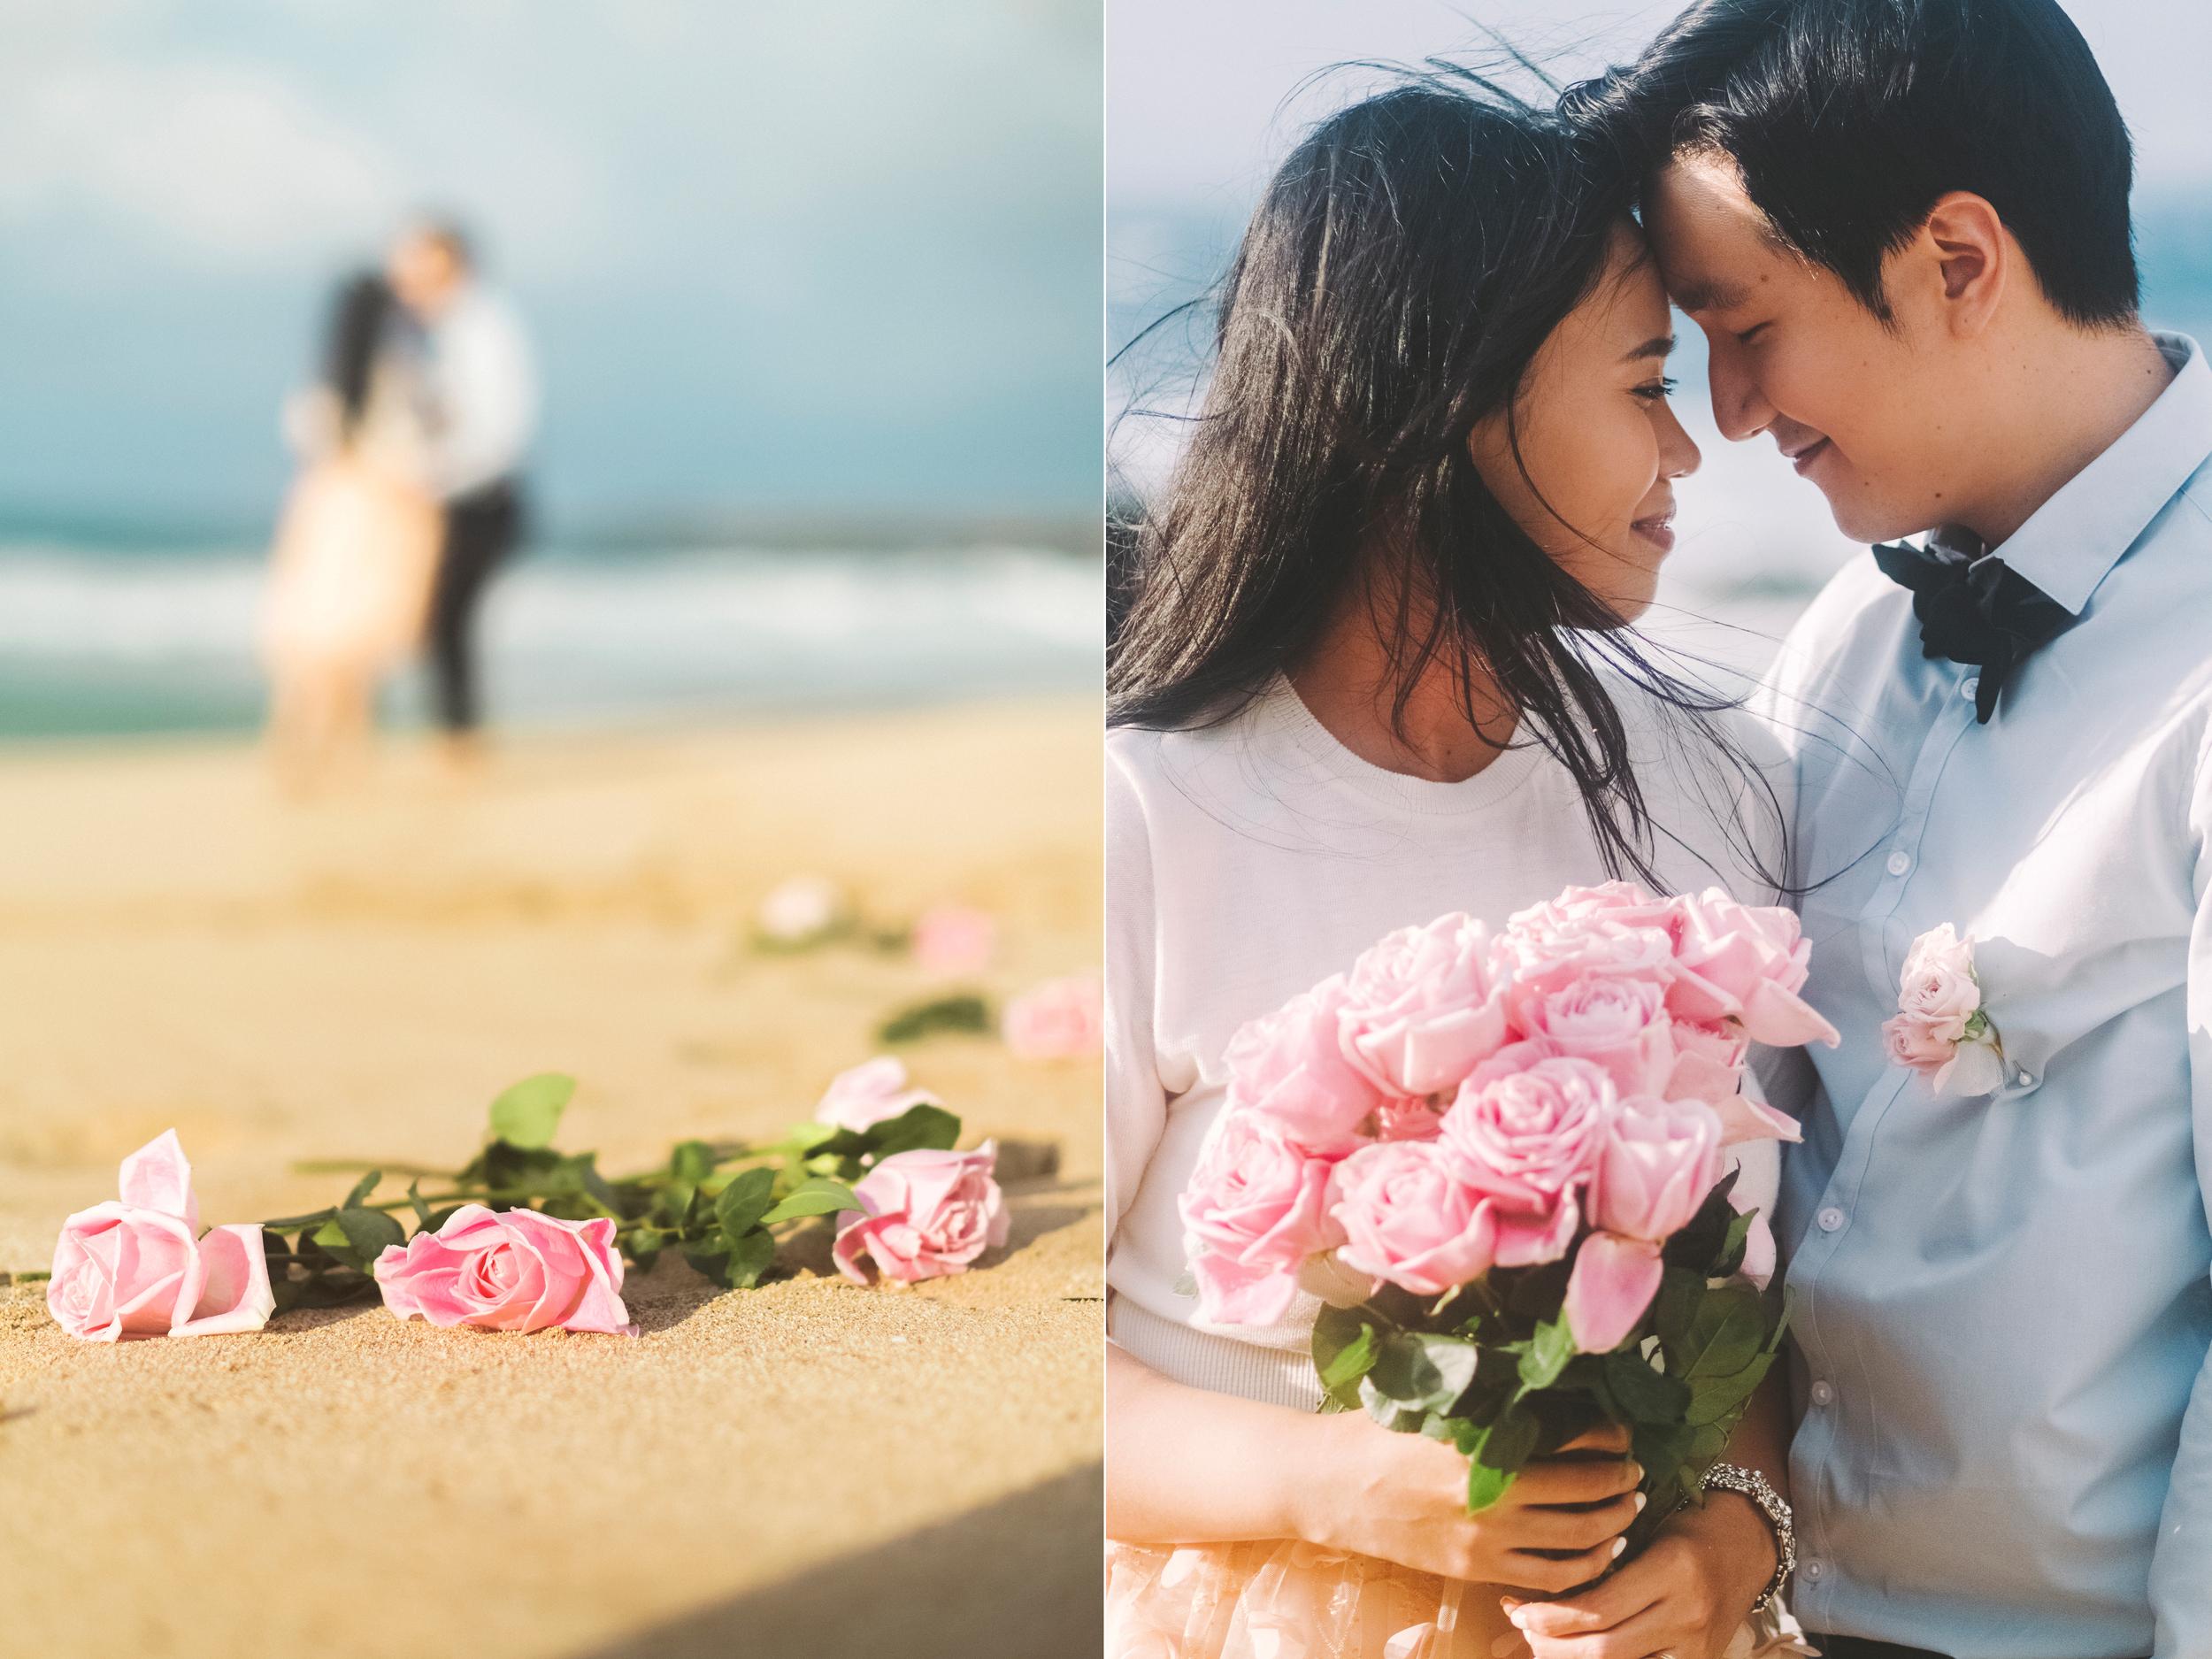 angie-diaz-photography-maui-elopement-ironwoods-beach-wedding-7.jpg